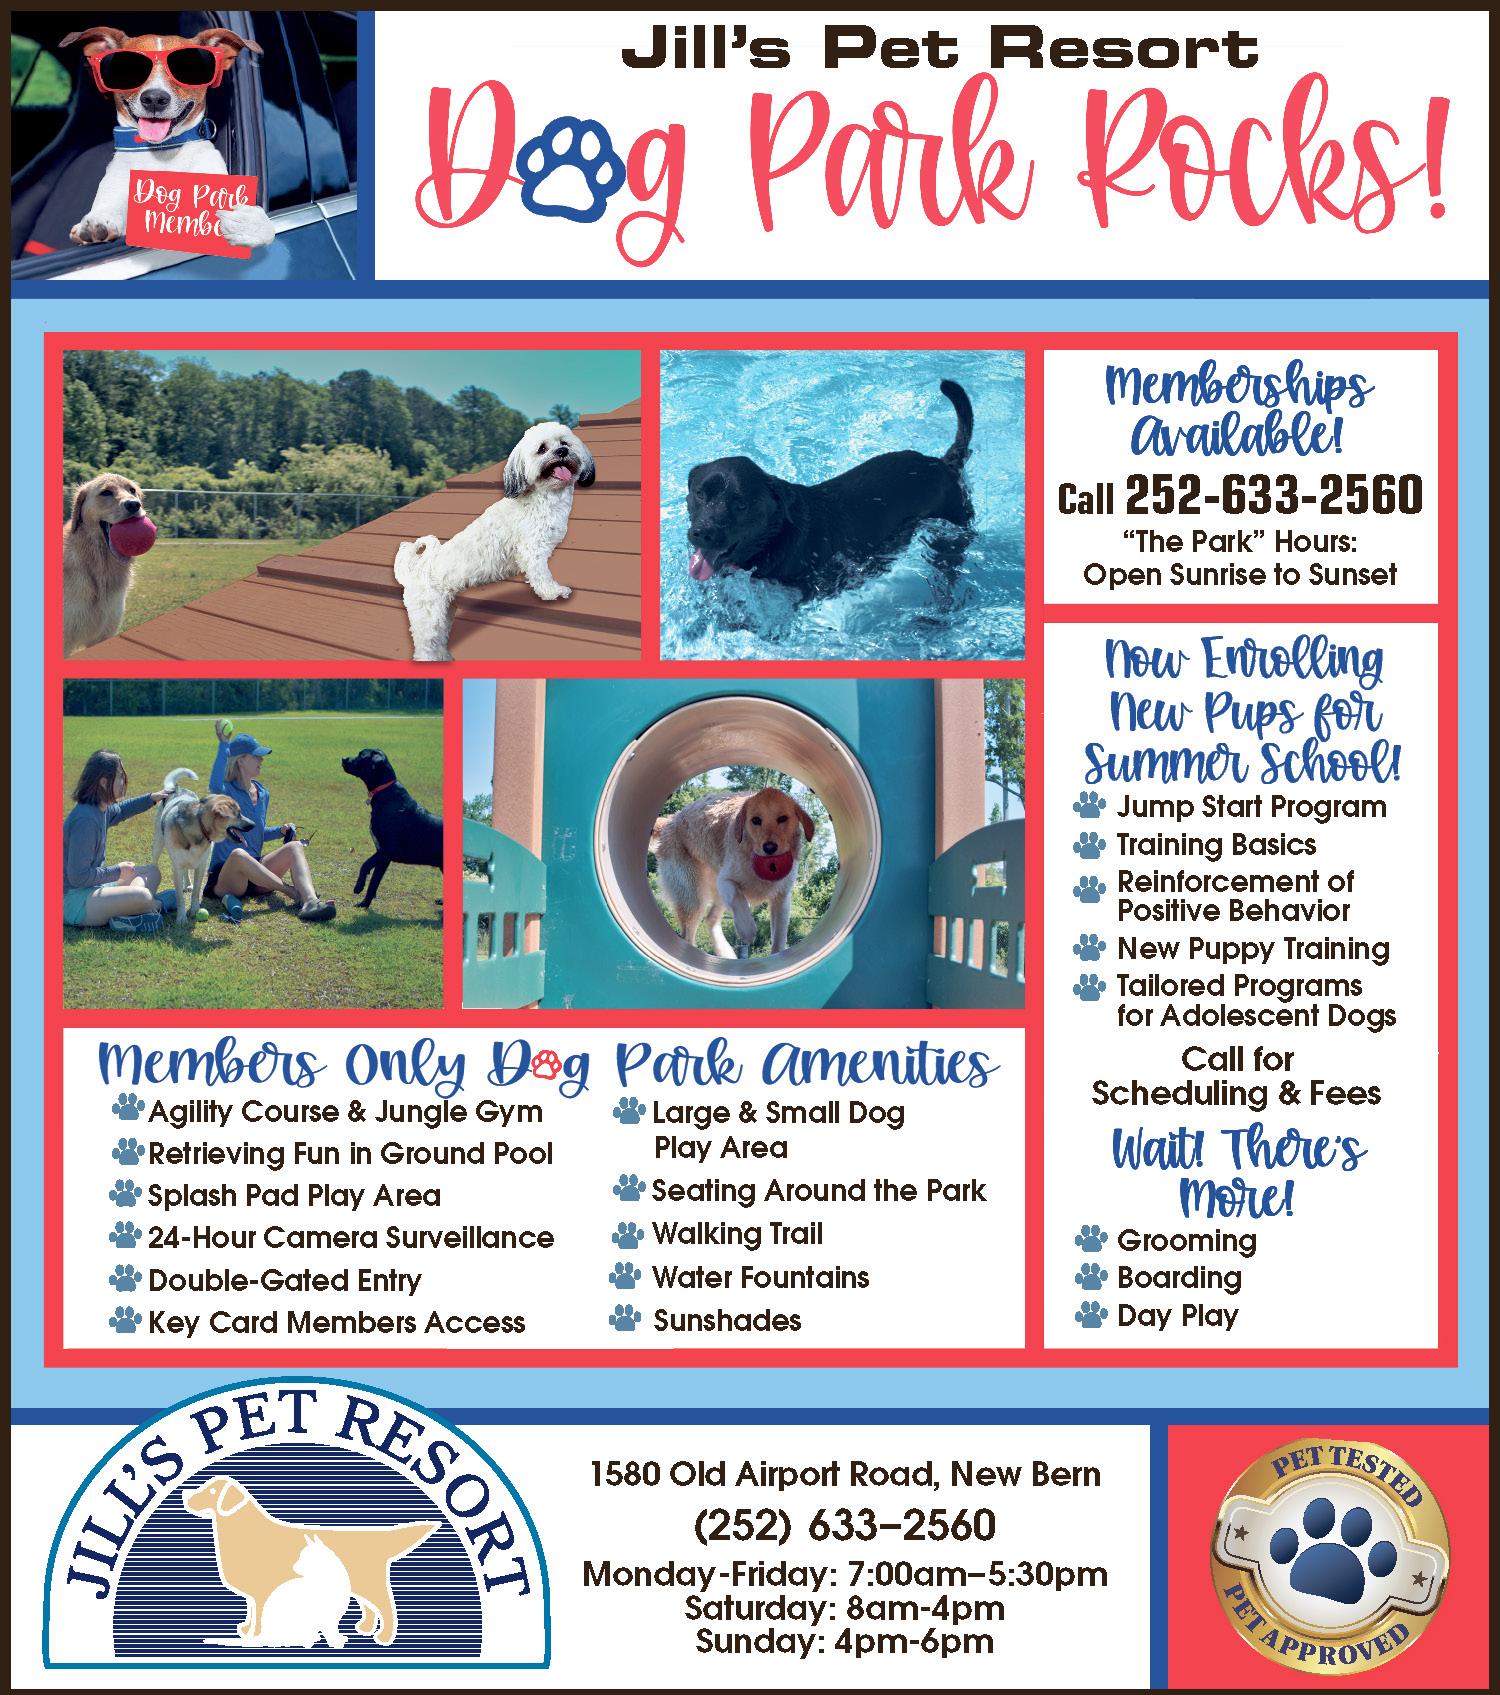 07-01-2021 Jill's Pet Resort Full Page Color Taberna